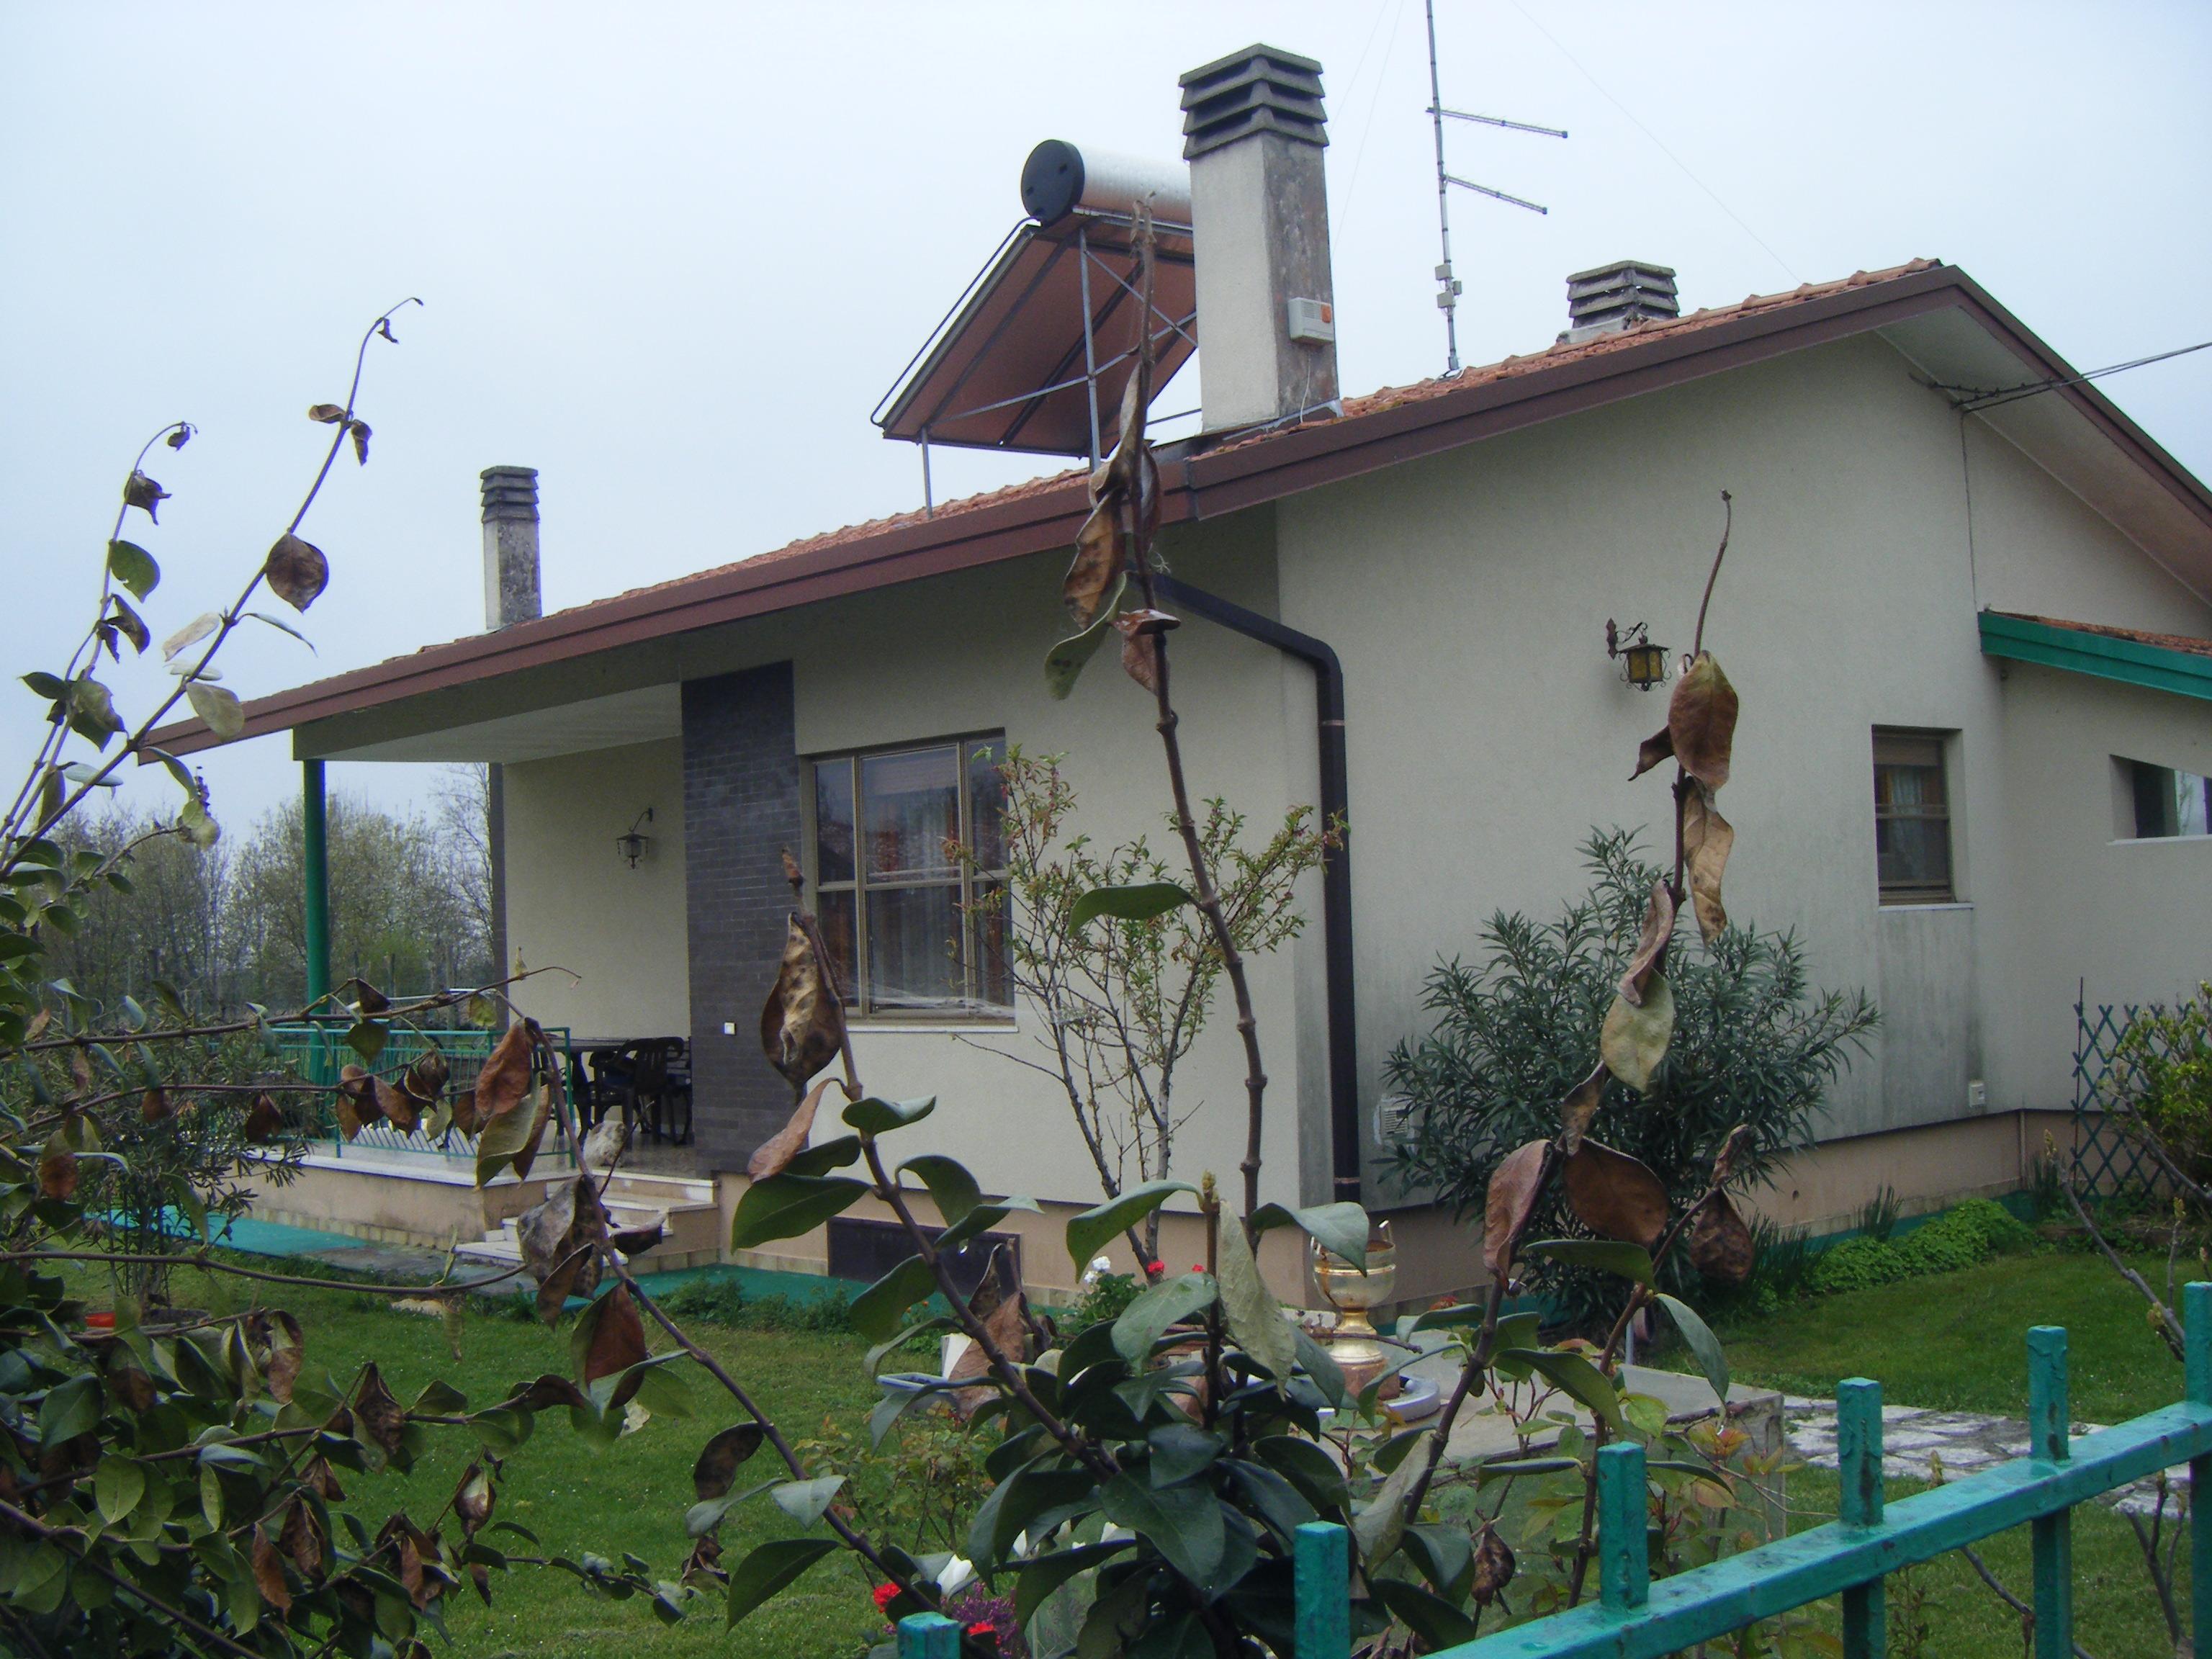 Casa singola san martino di campagna pn 42 for Piani casa di campagna rialzata